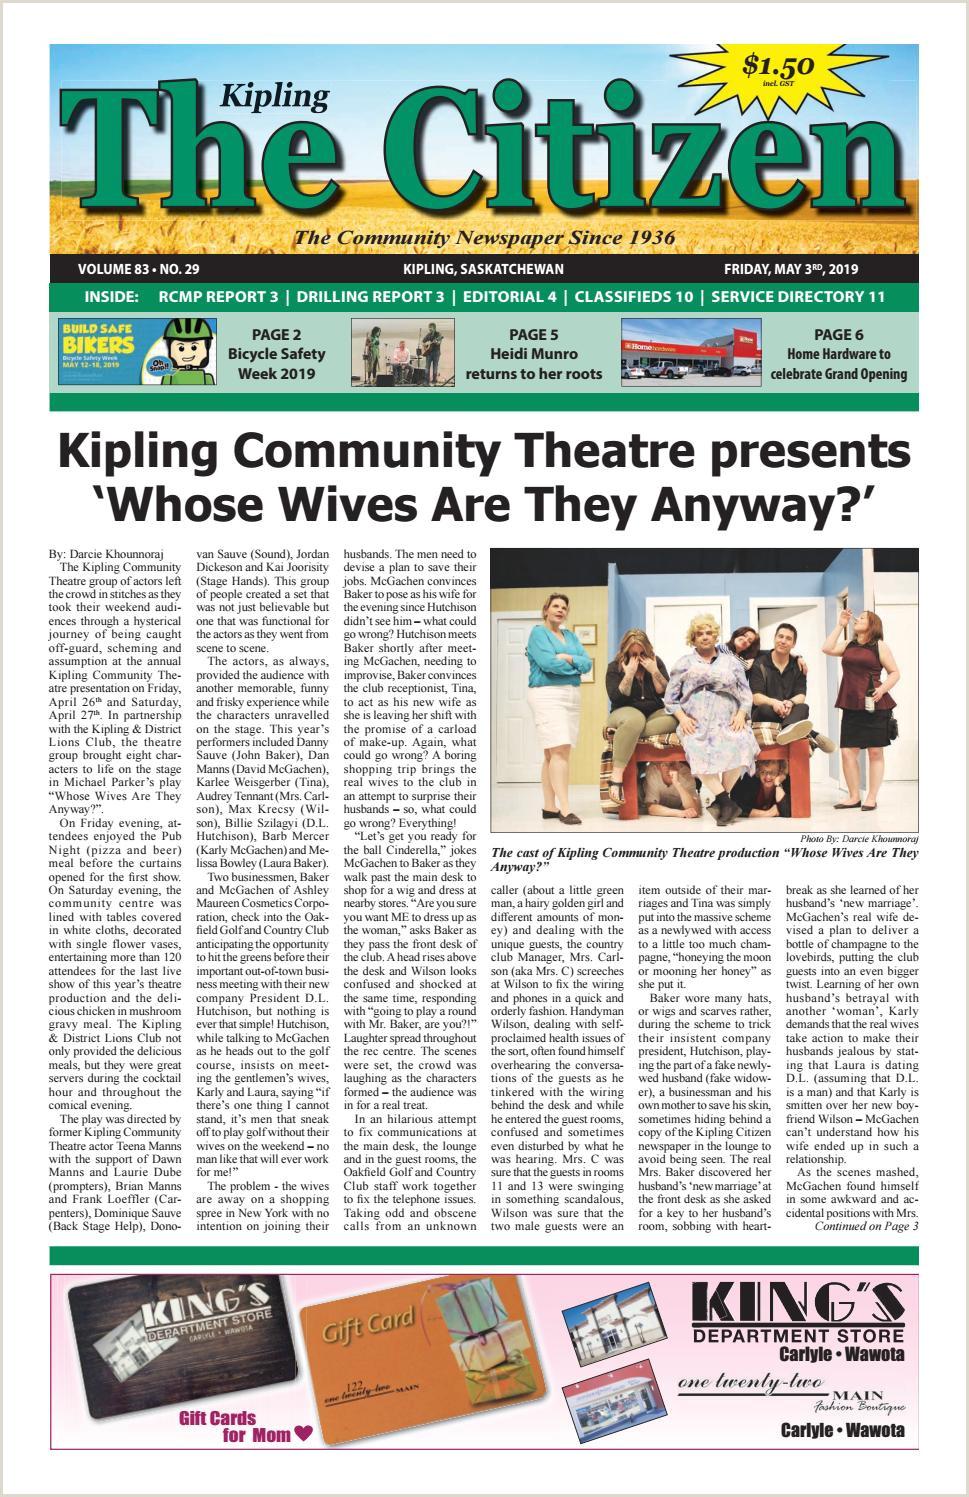 Kipling Citizen May 3 2019 by Kipling Citizen issuu